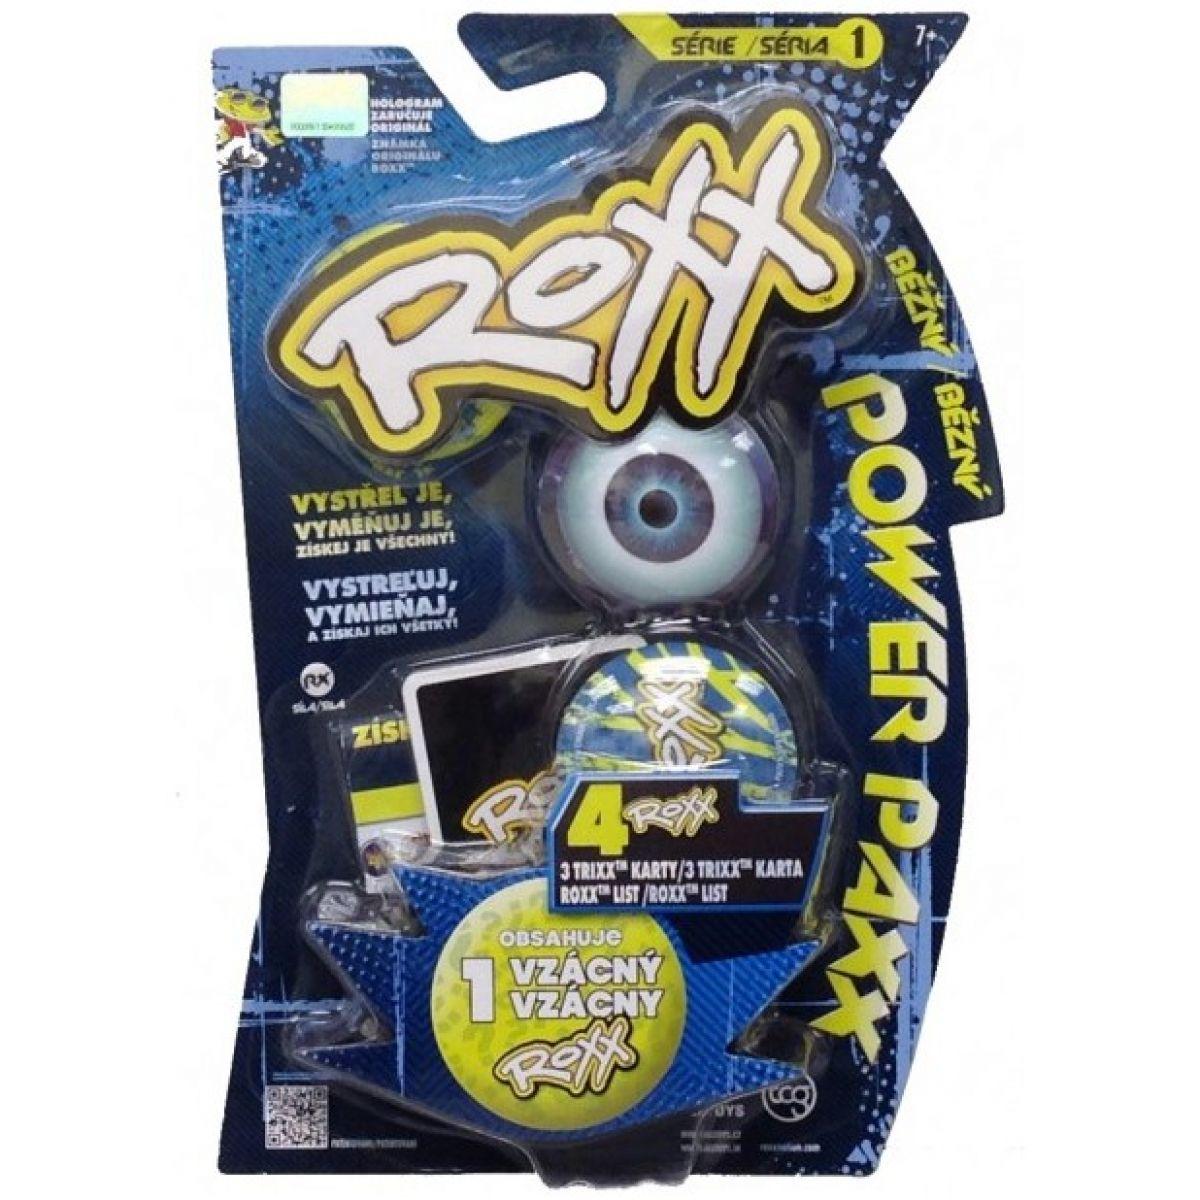 ROXX 3311201 - ROXX power pack  - 4 ks